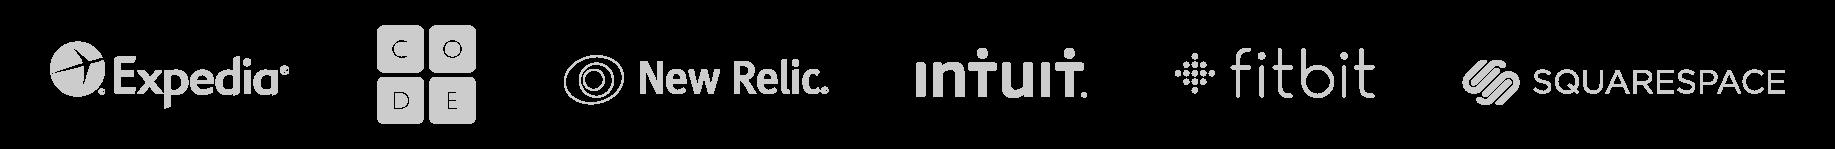 HipChat をご利用のお客様: Expedia, Code, New Relic, Intuit, Fitbit, Square